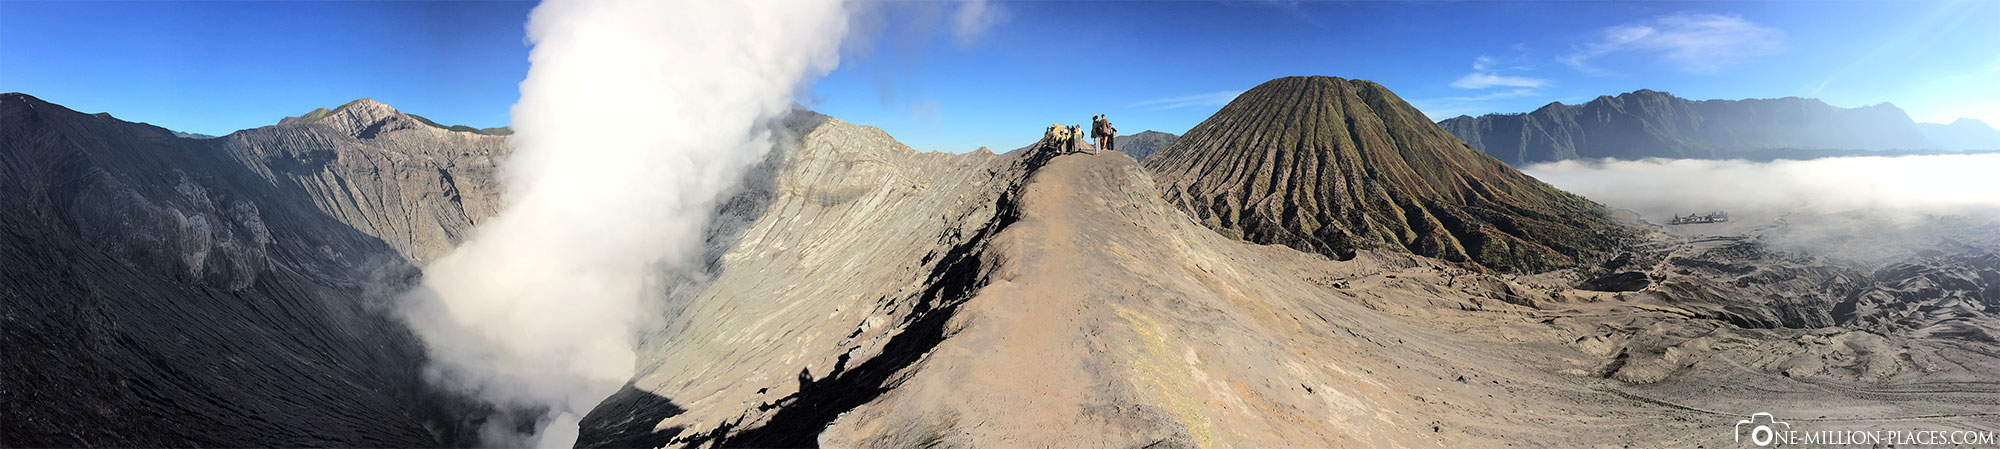 Panoramic view, Mount Bromo, Crater, Java Island, Indonesia, Tour, Travelreport